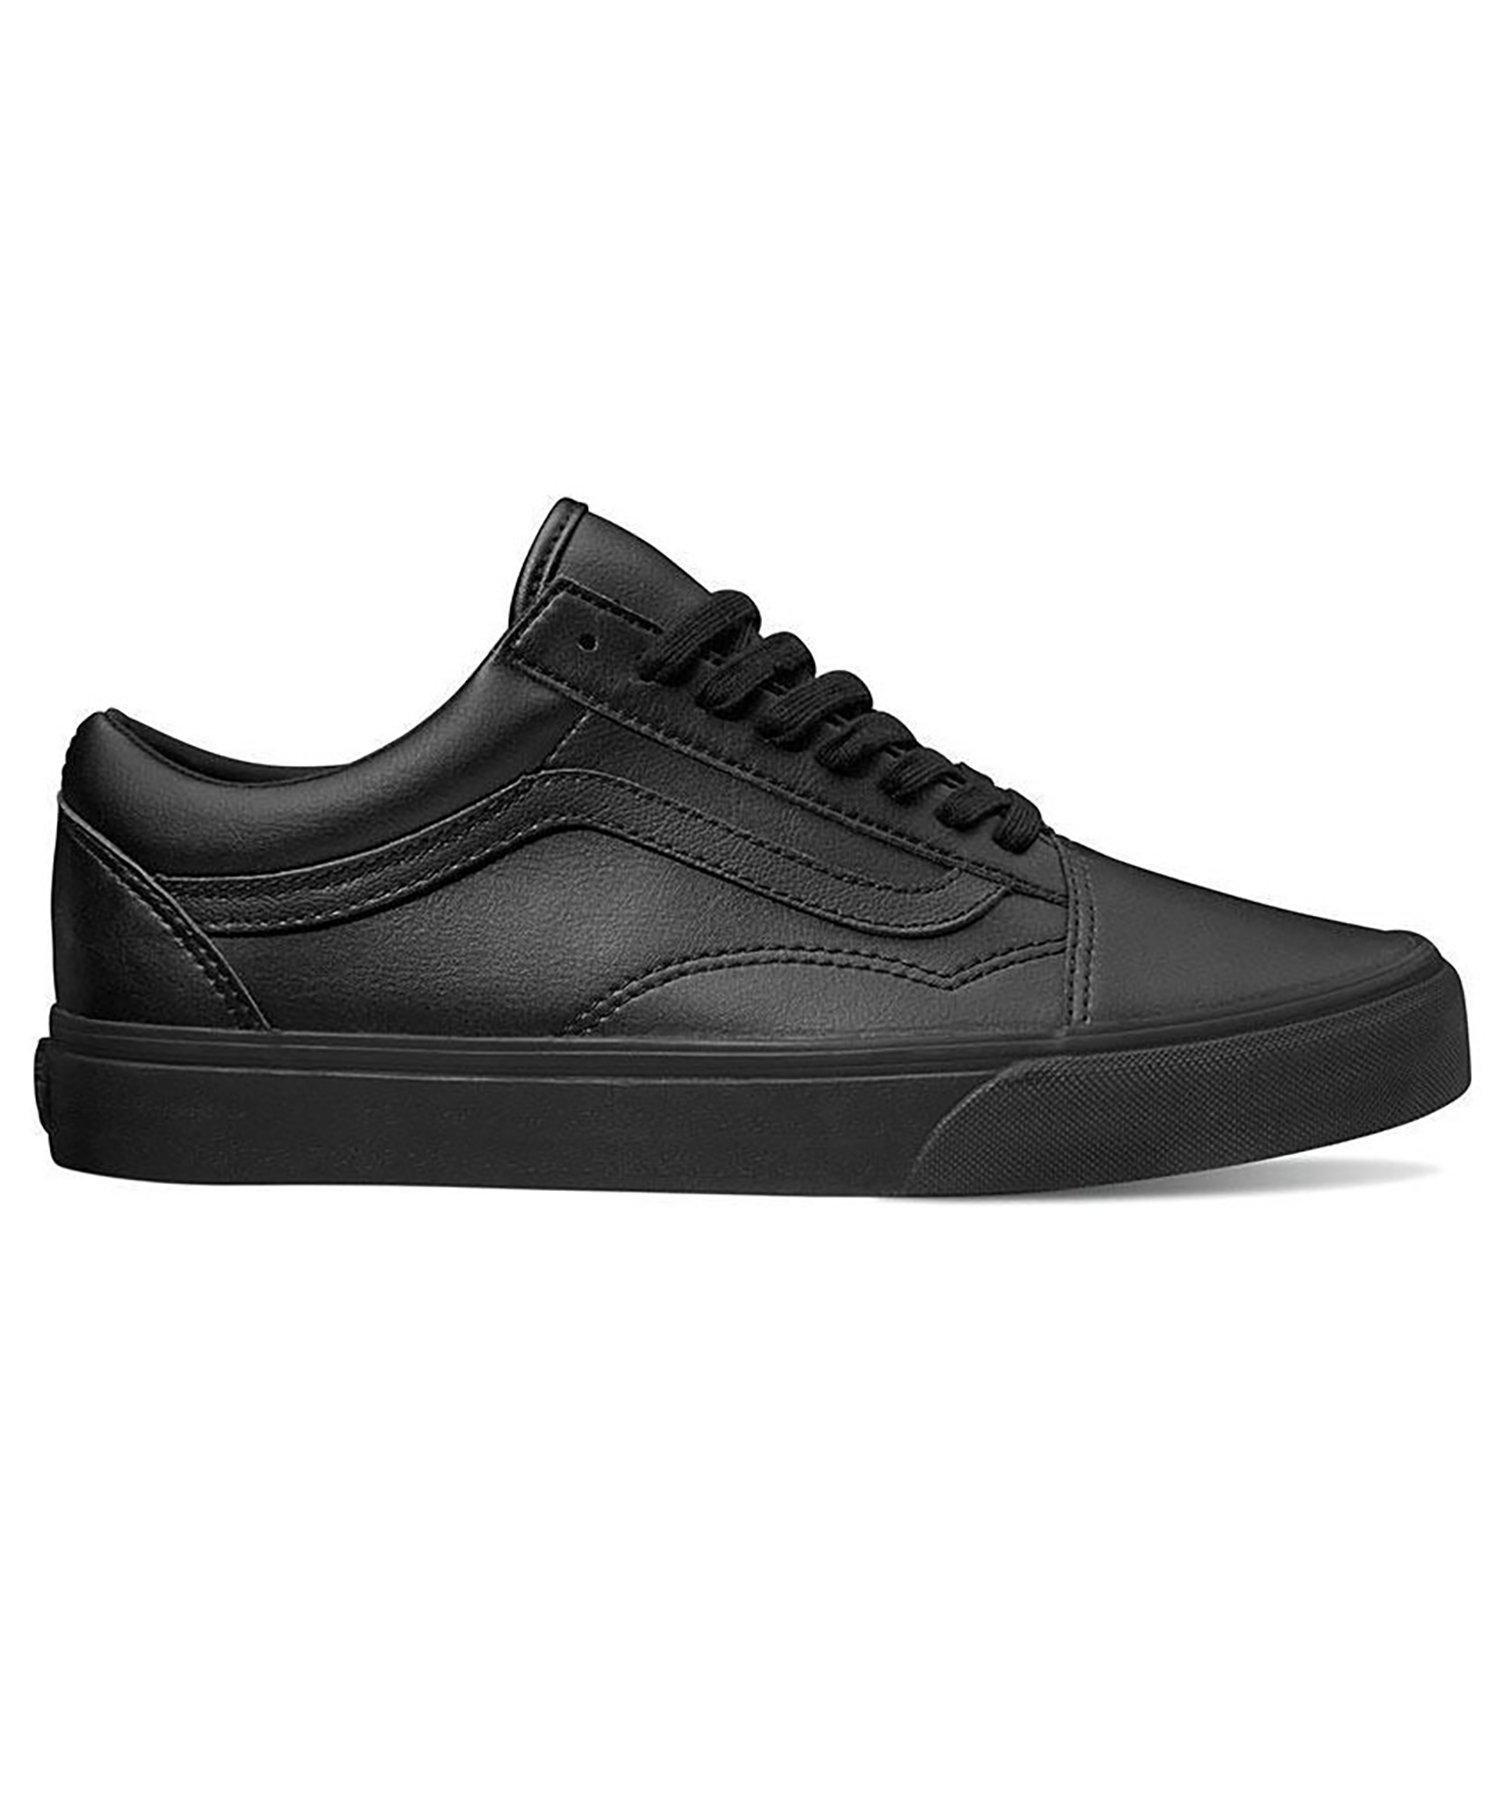 Lyst - Vans Old Skool In Black Mono Tumble Dry Leather in Black for Men 576ad297c